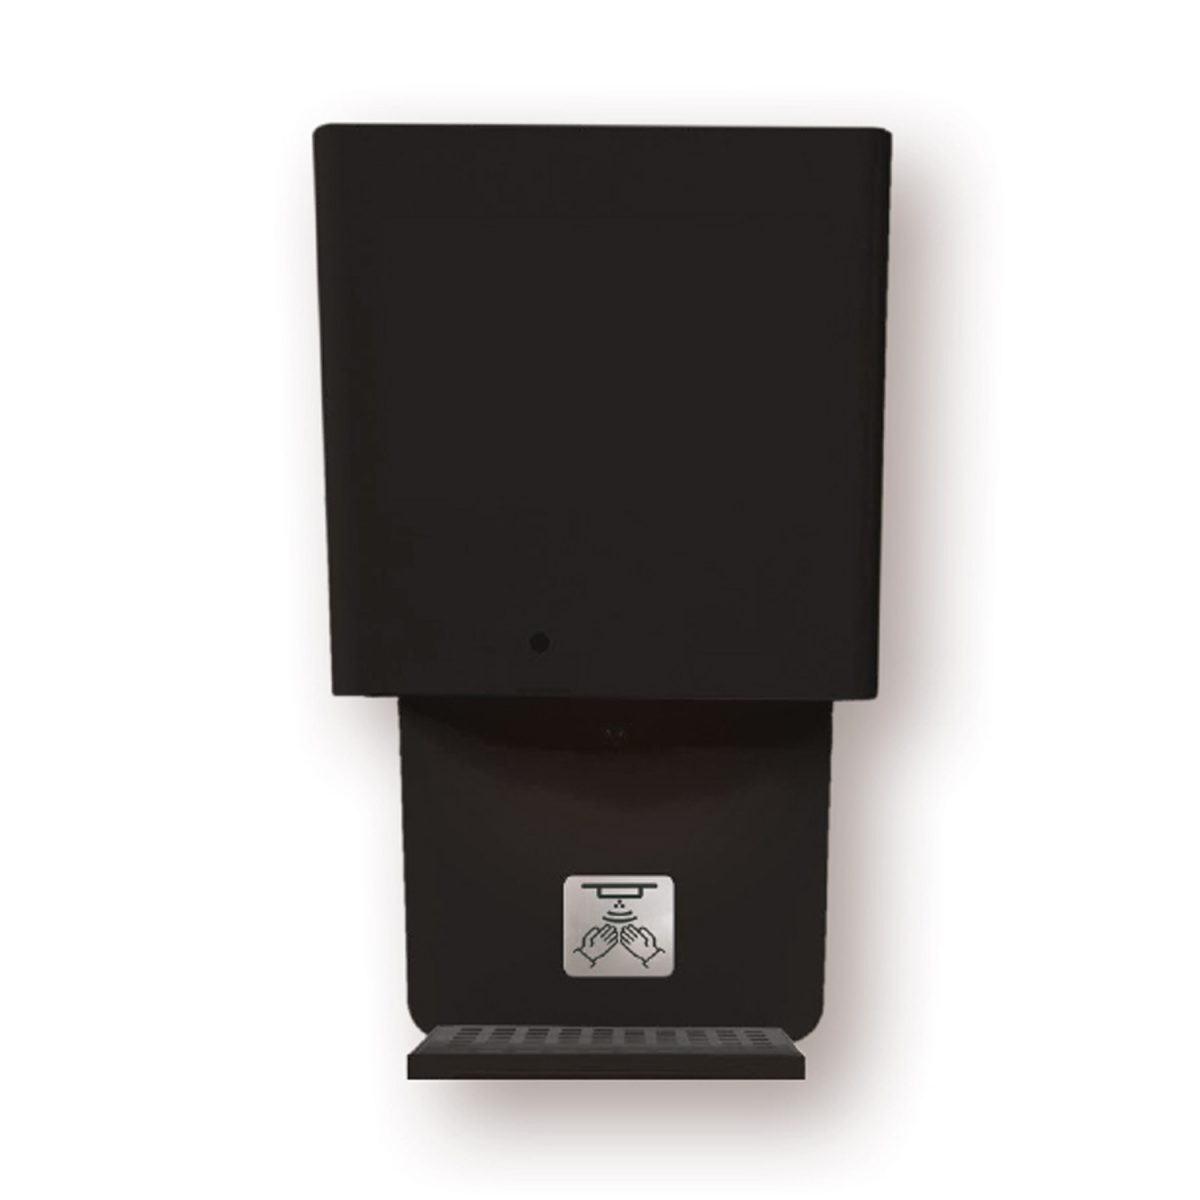 Hygienesäule Standard Wandmodell schwarz